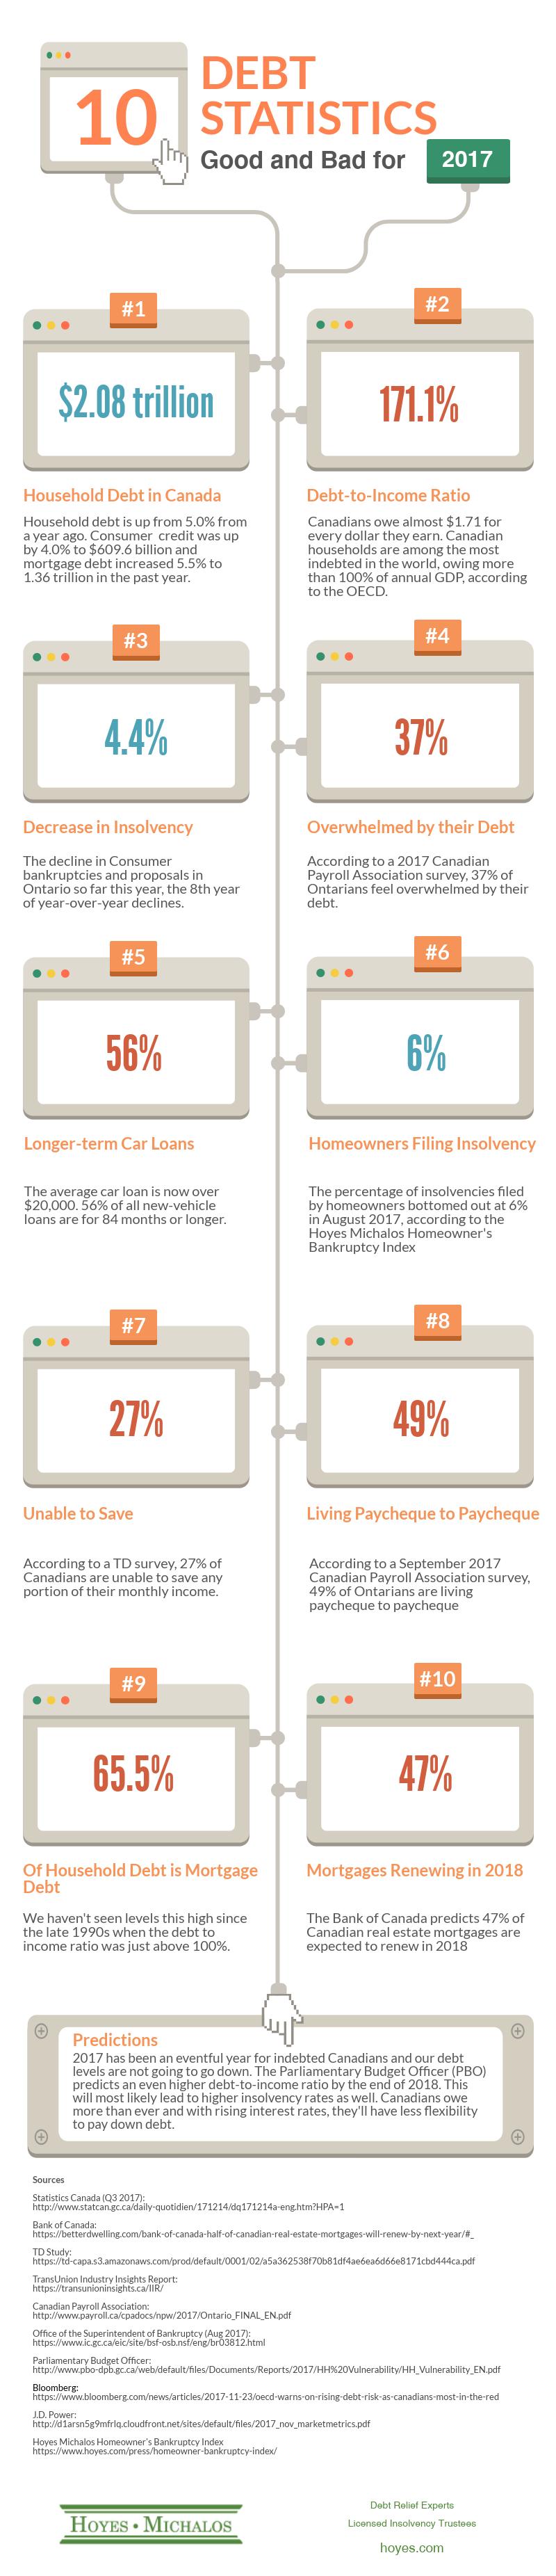 10-debt-stats-infographic